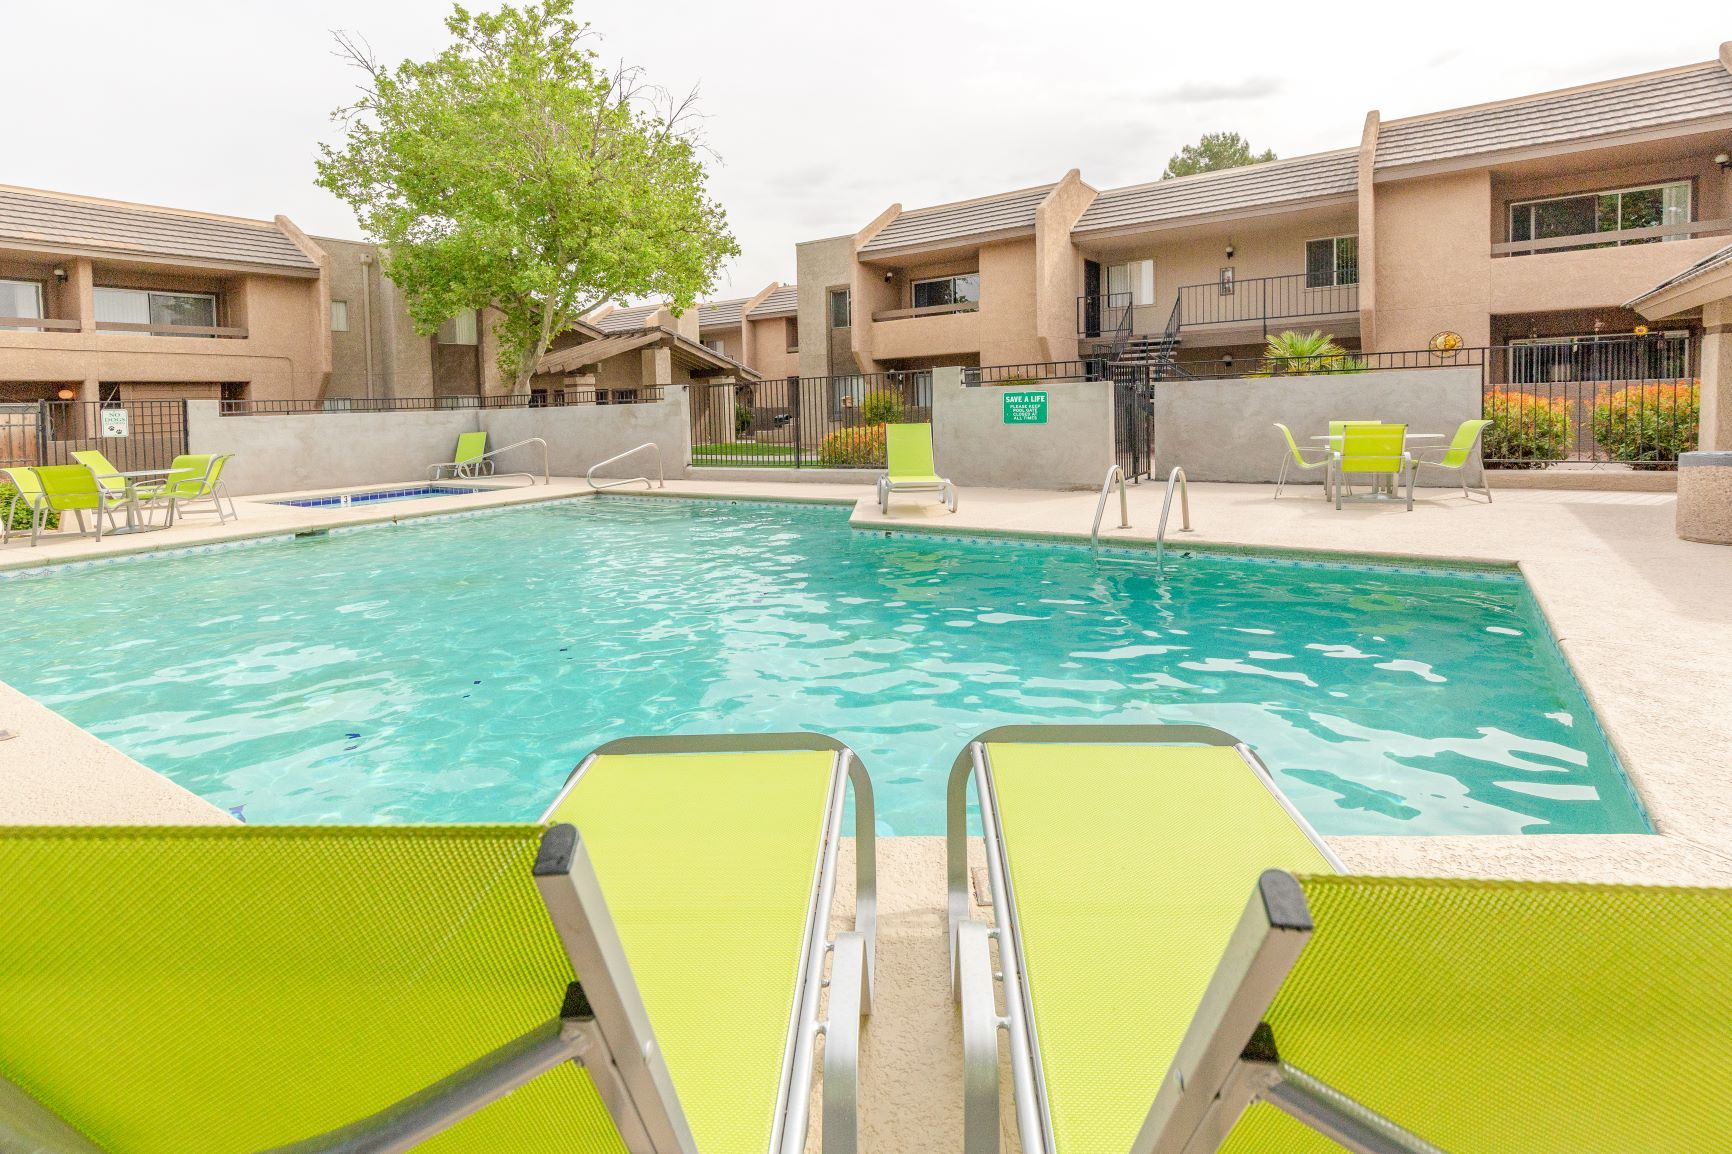 home to Cimarron Apartments in Tucson, Arizona